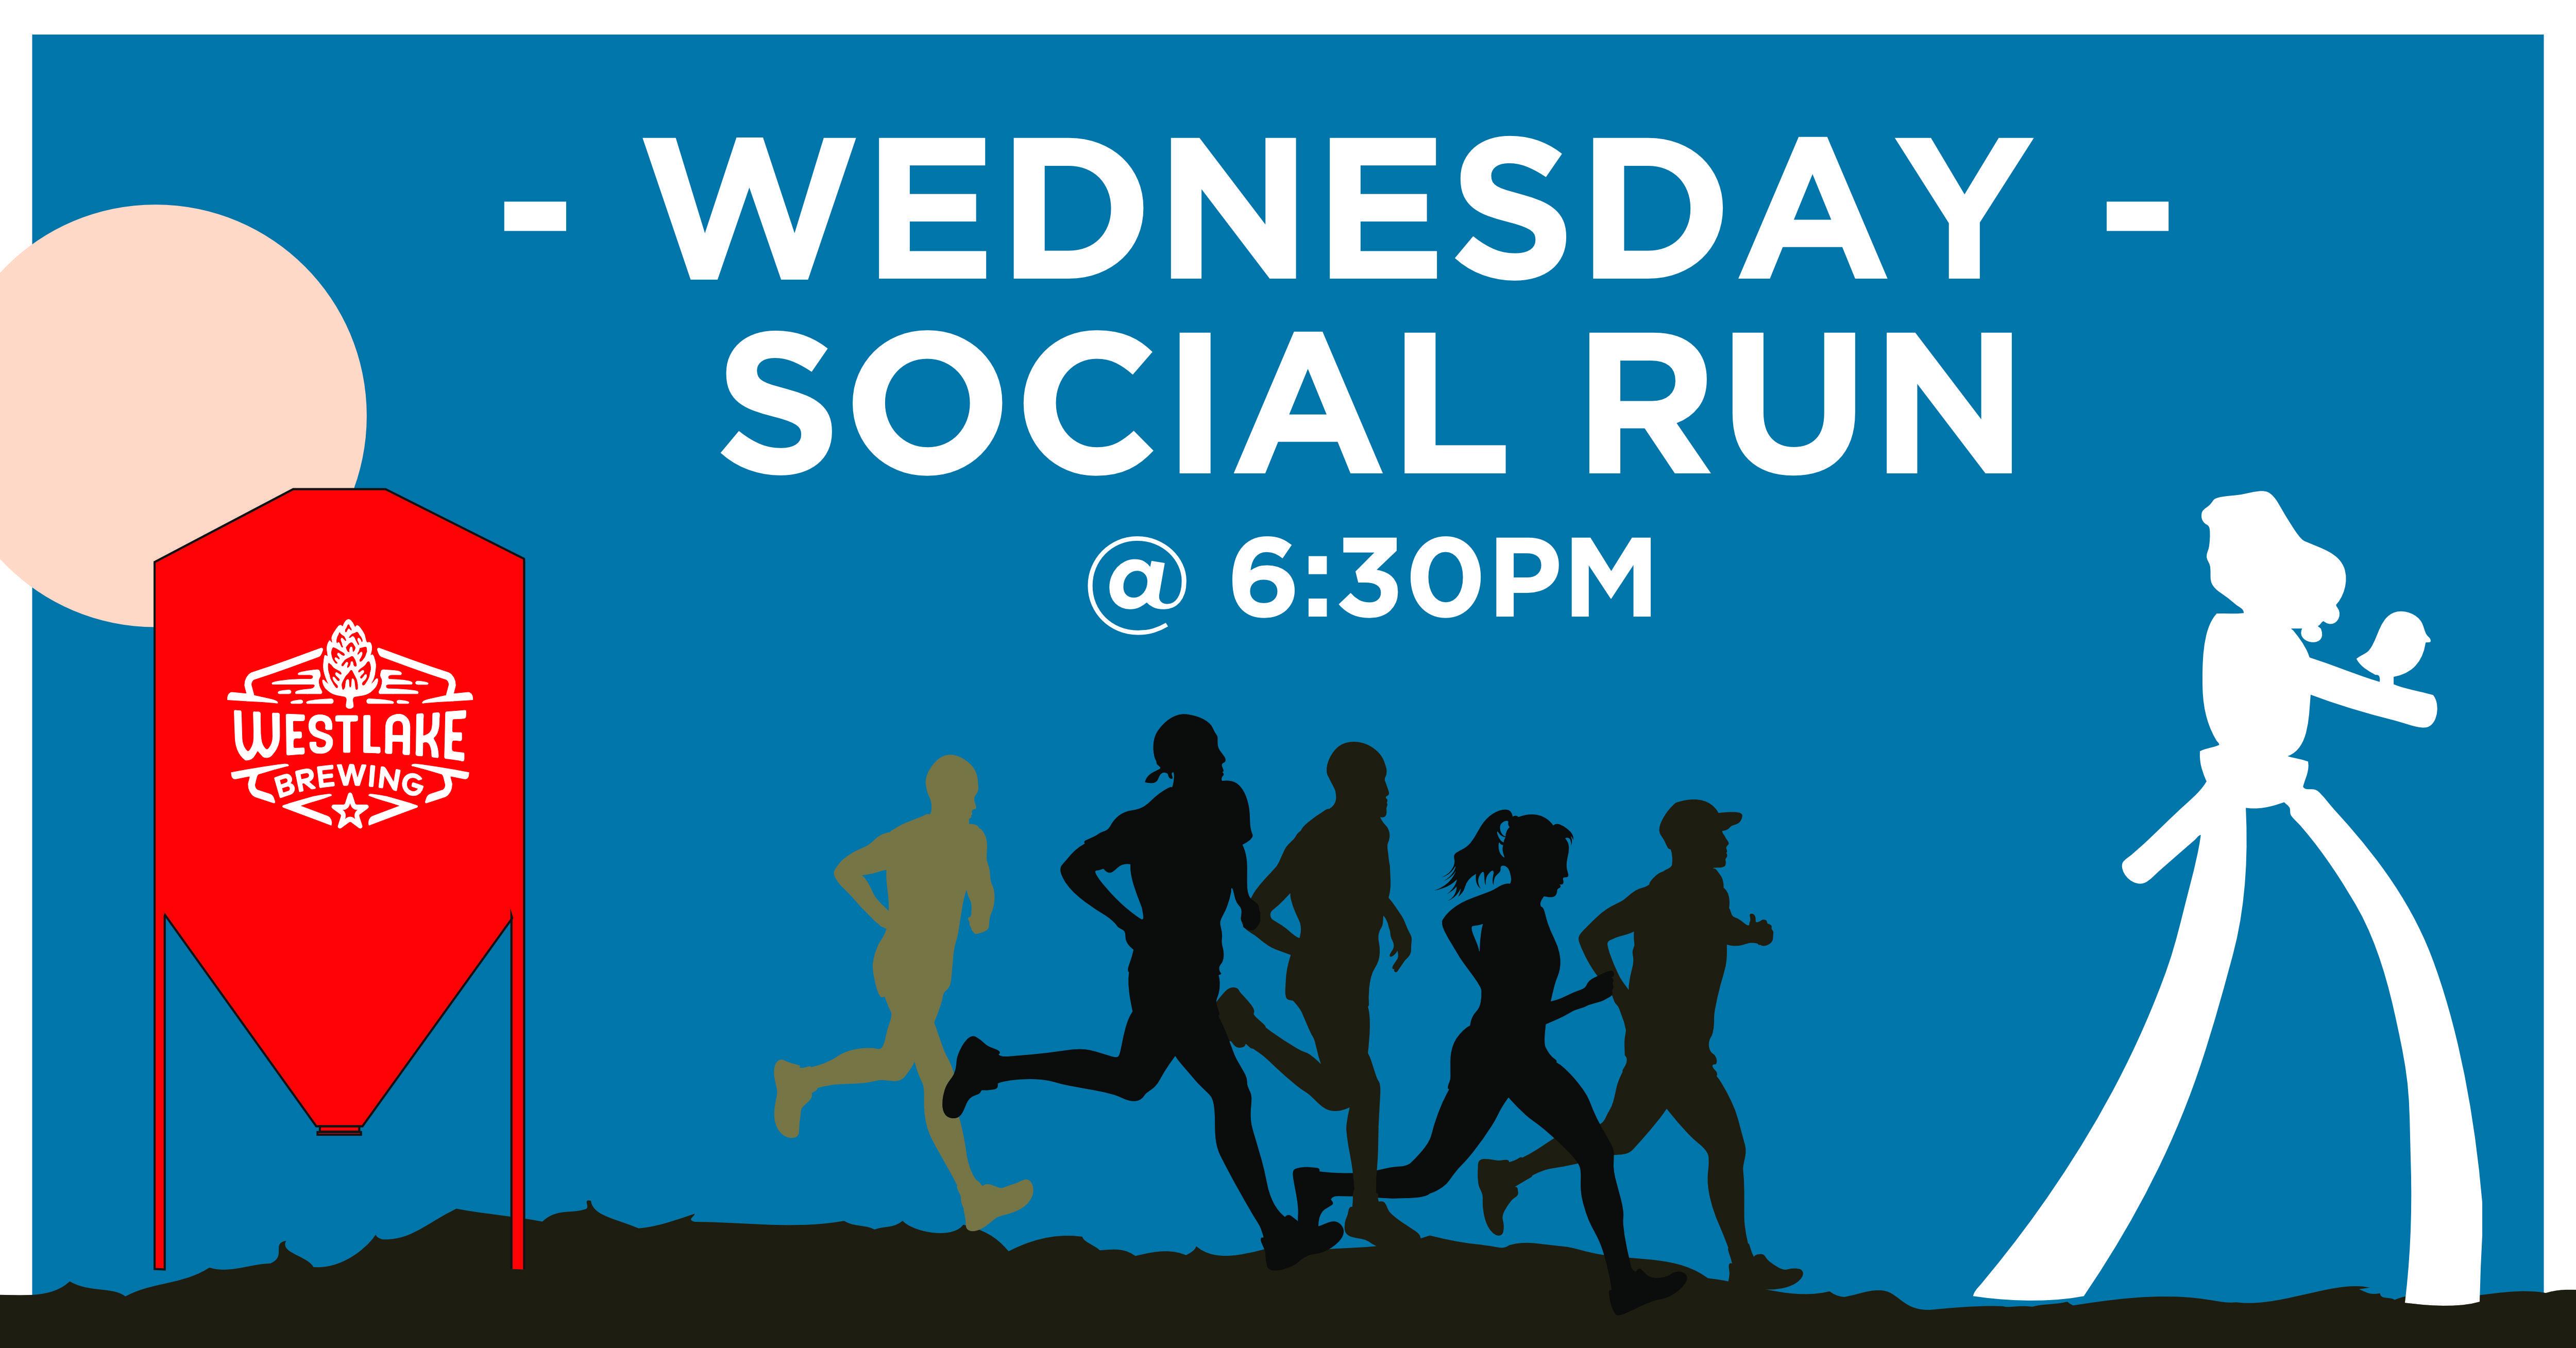 Wednesday Social Run @ Westlake Brewing Co., Deep Ellum